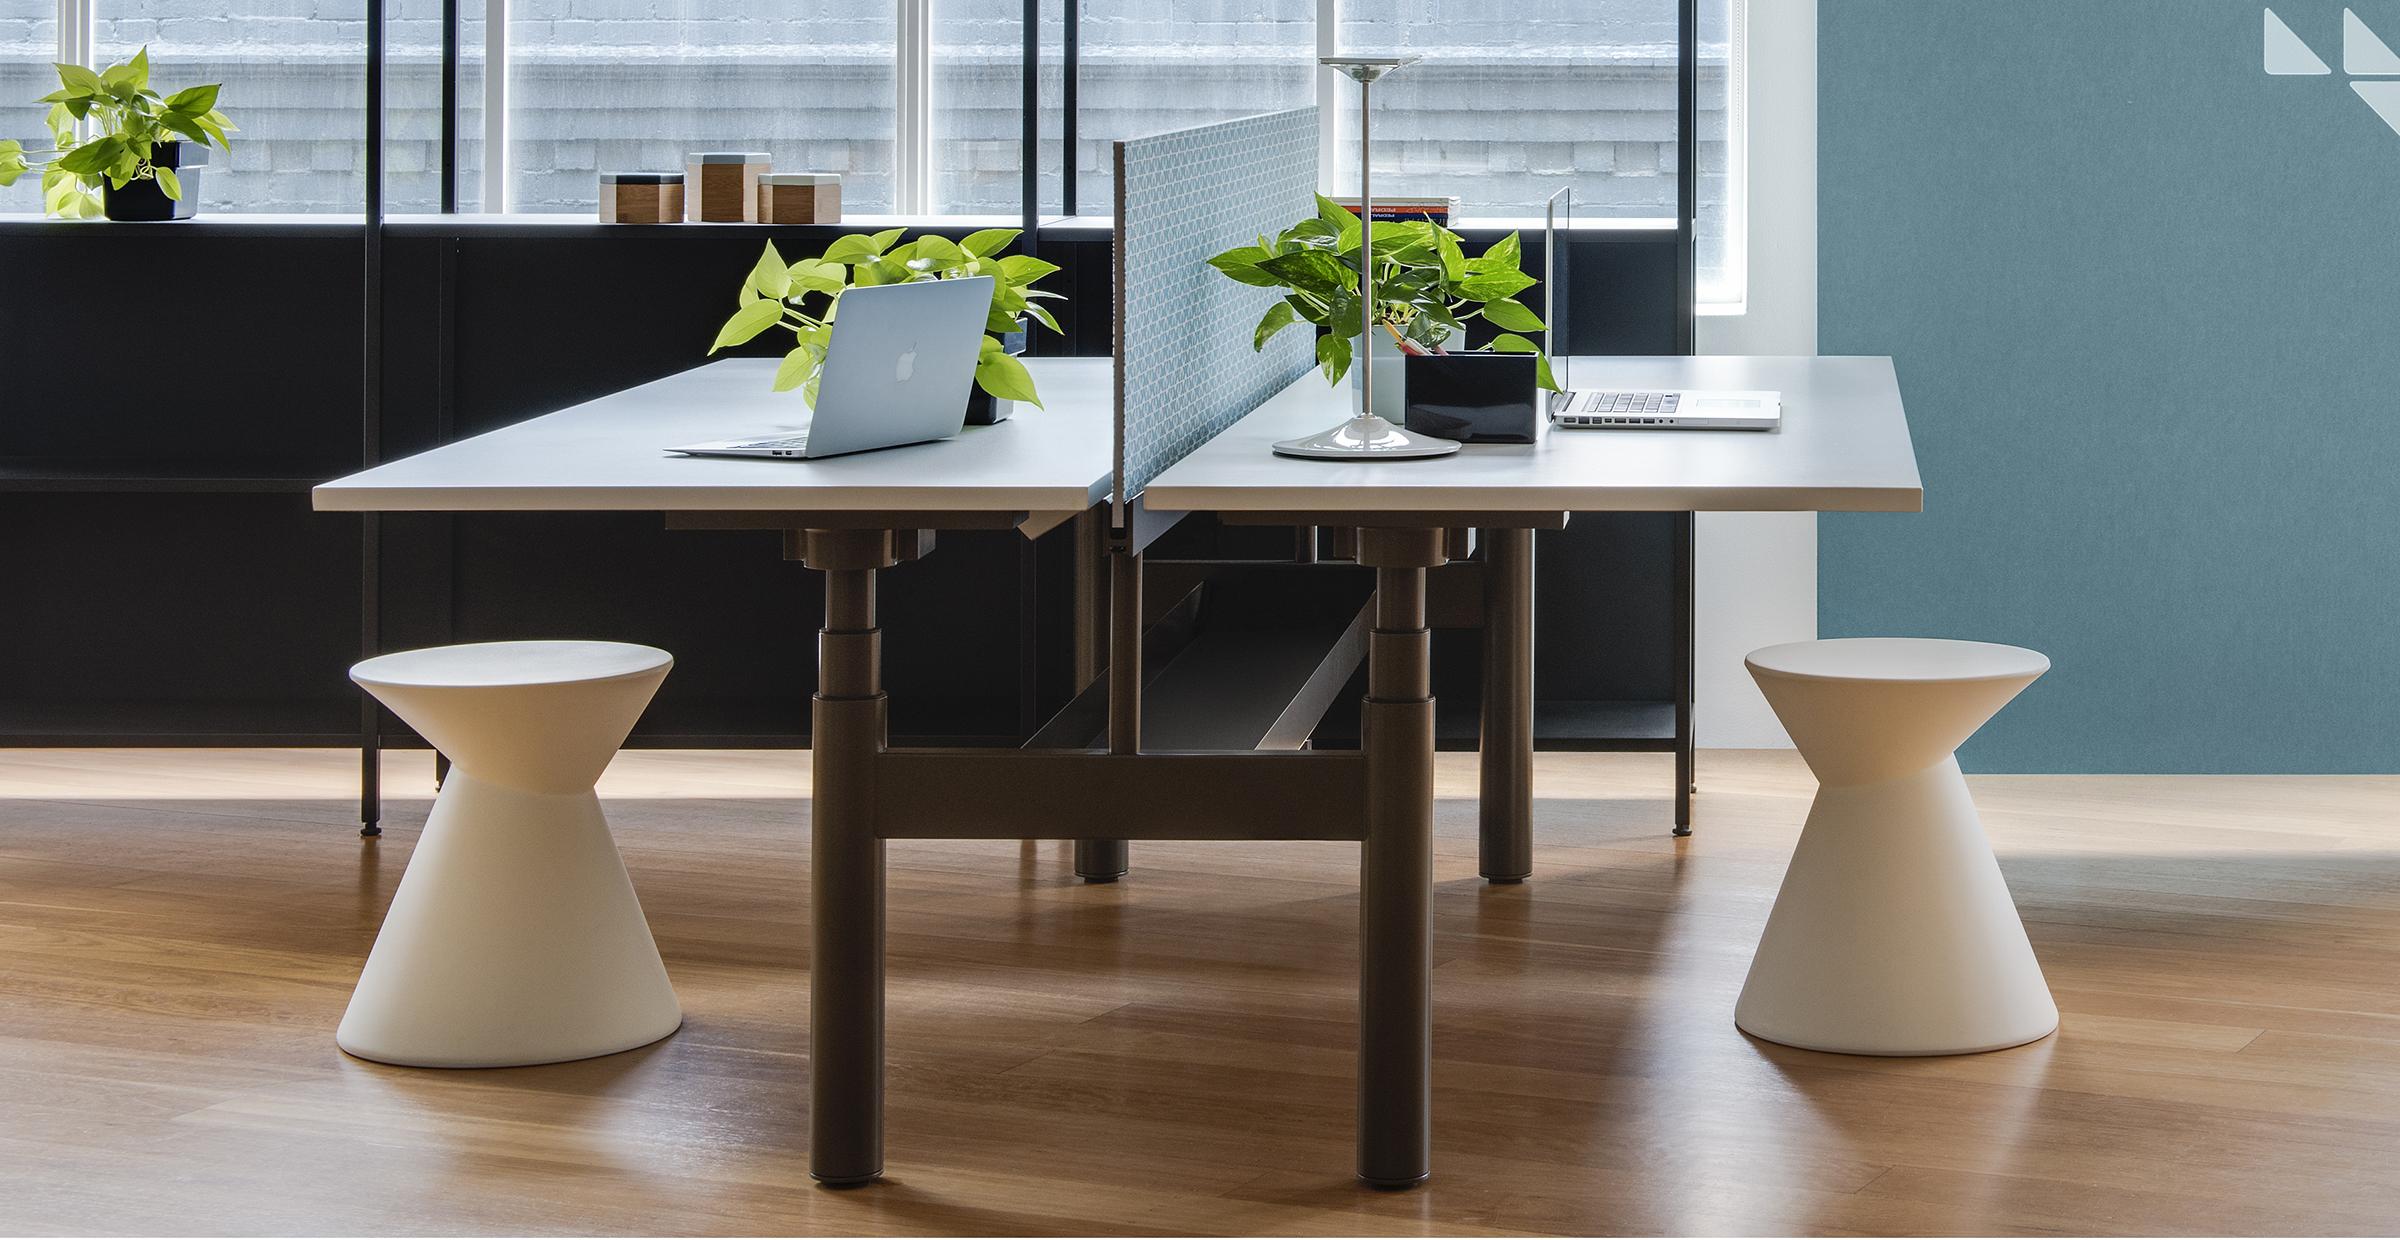 lala-stool